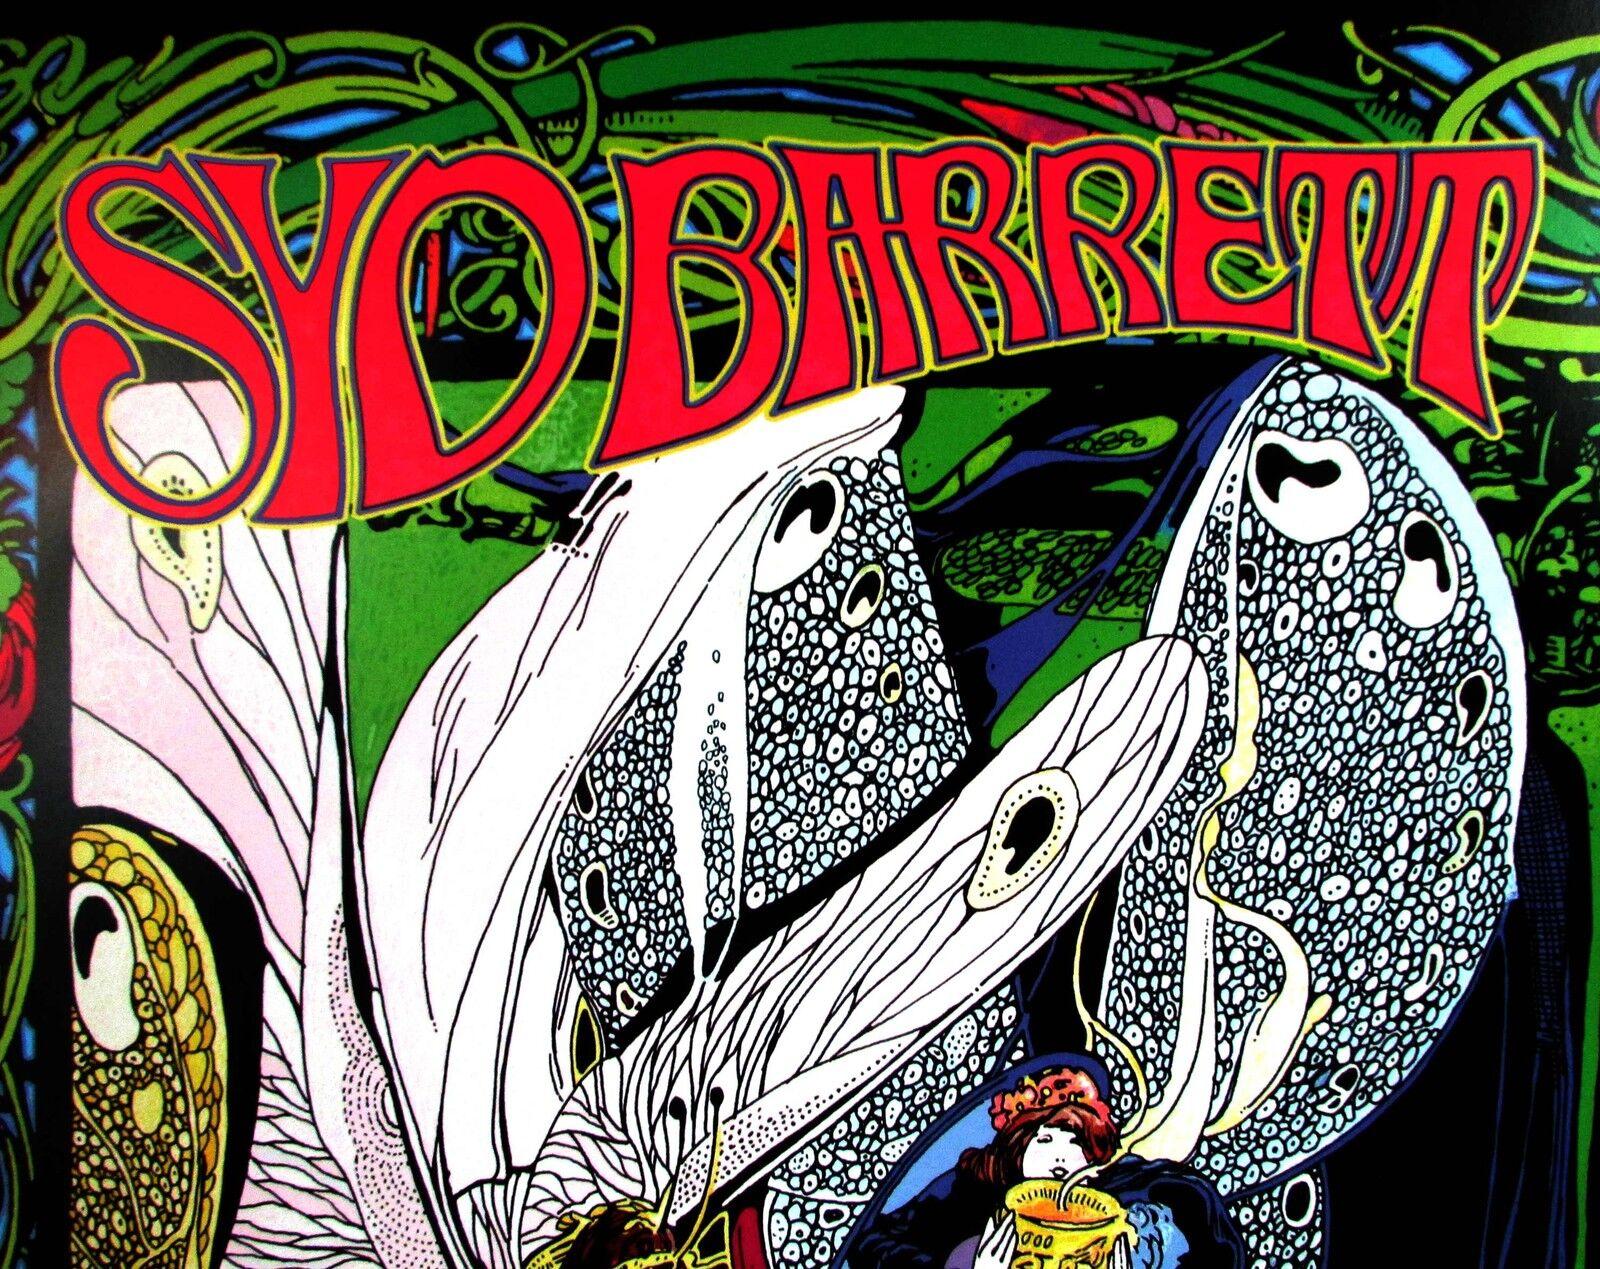 BOB MASSE SYD BARRETT COMMEMORATIVE ROCK POSTER SIGNED BY ARTIST